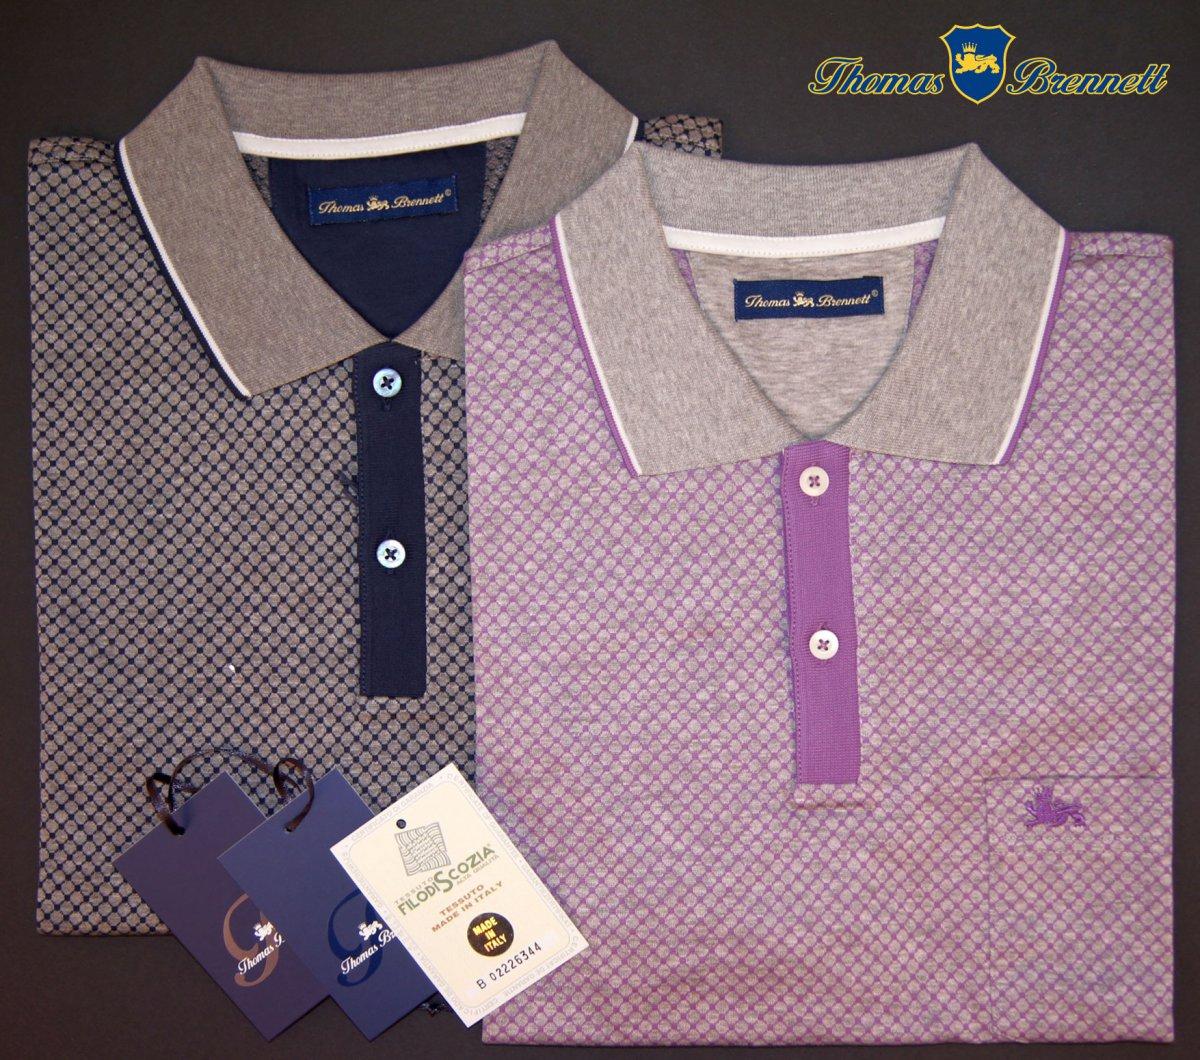 f46b2f21696 Магазин мужской одежды Thomas Brennett